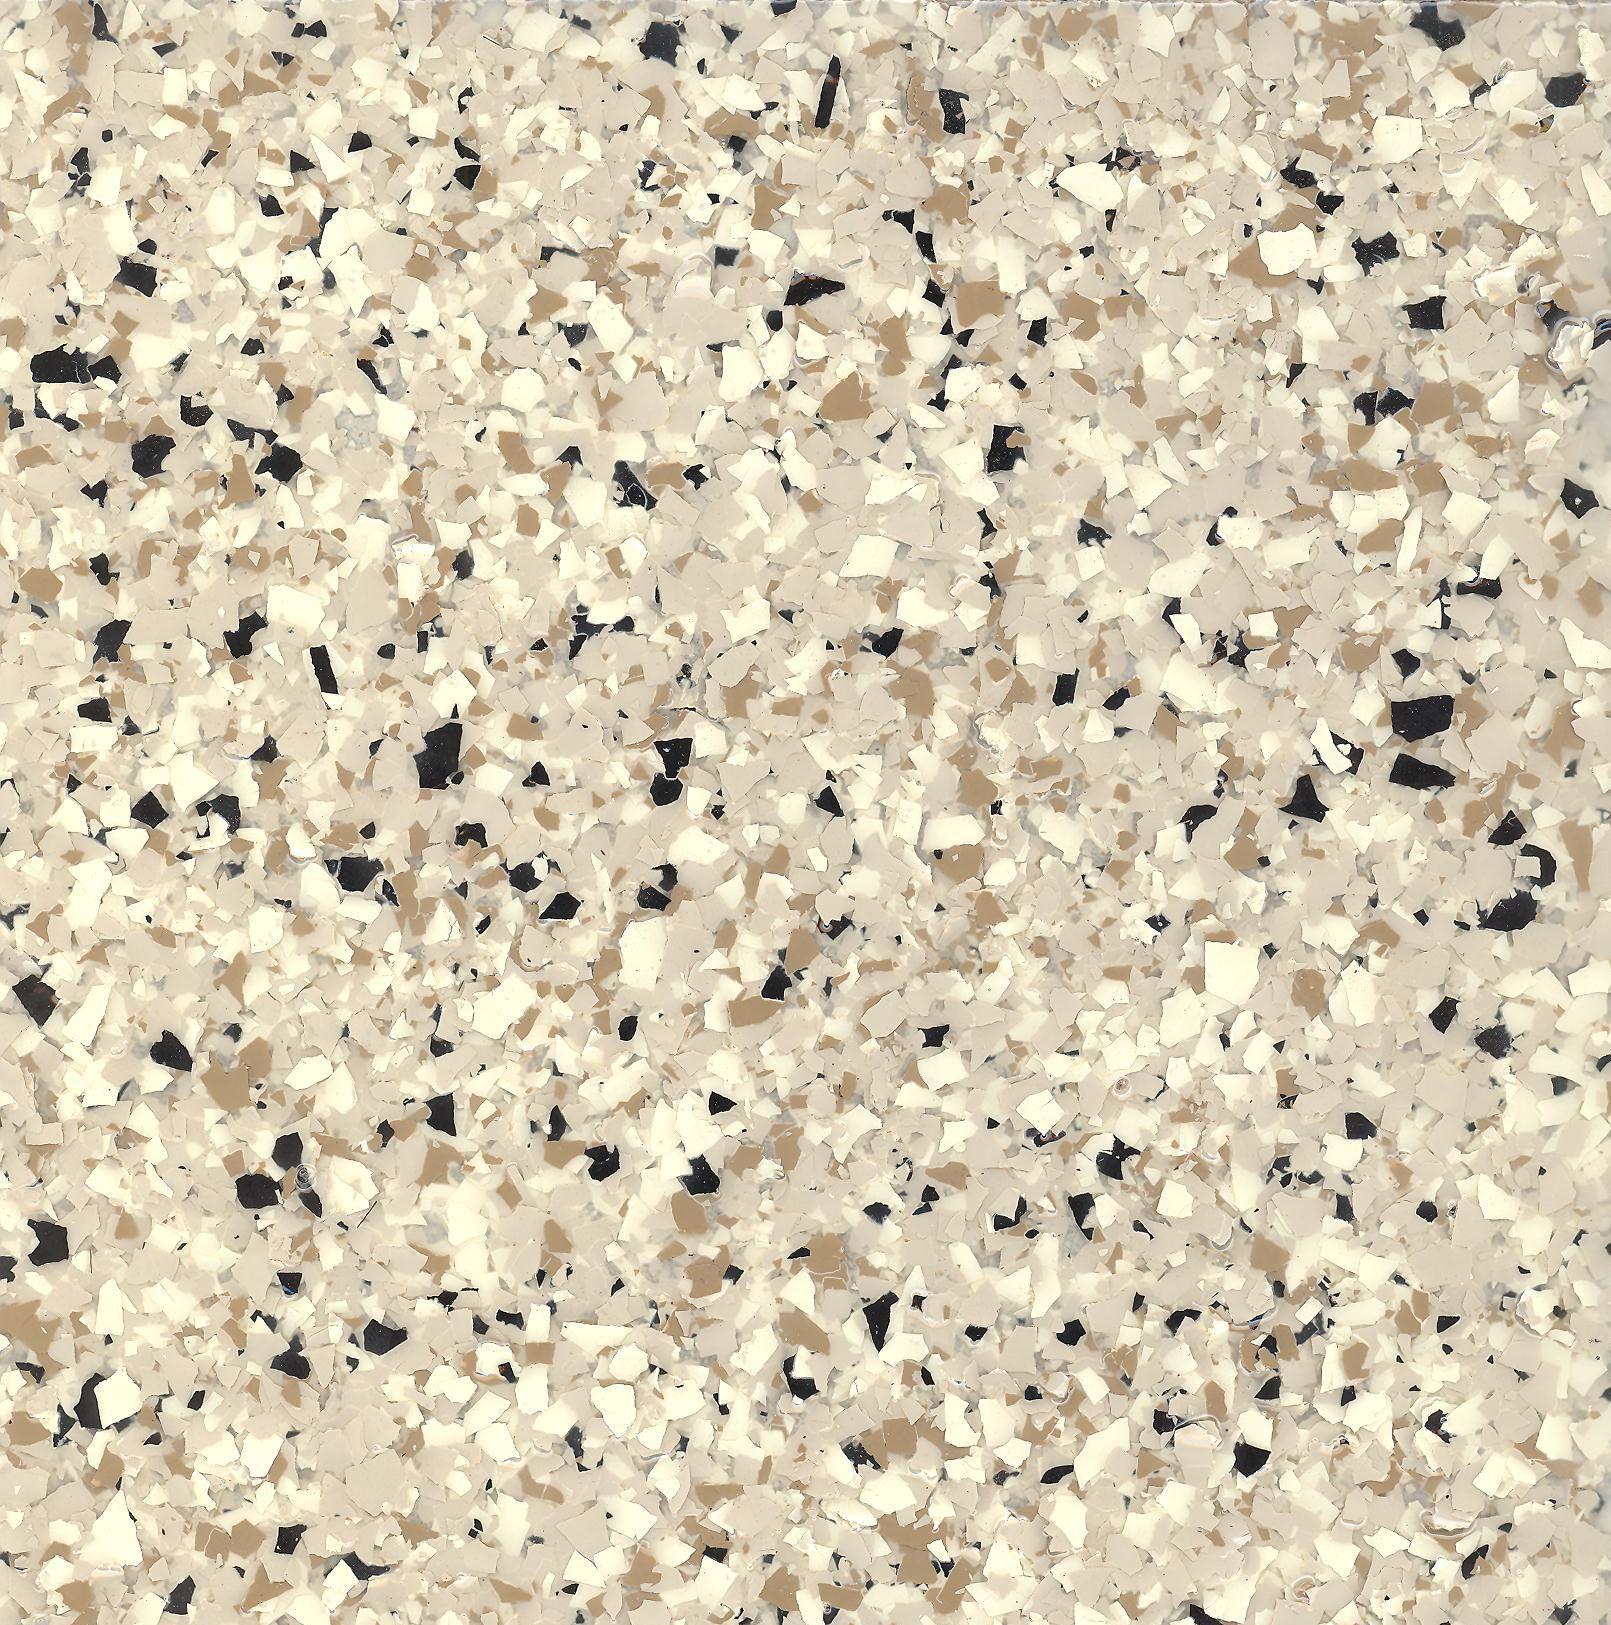 Exquisite Rustoleum Professional Garage Floor Coating Reviews And Rustoleum Garage  Floor Paint Temperature